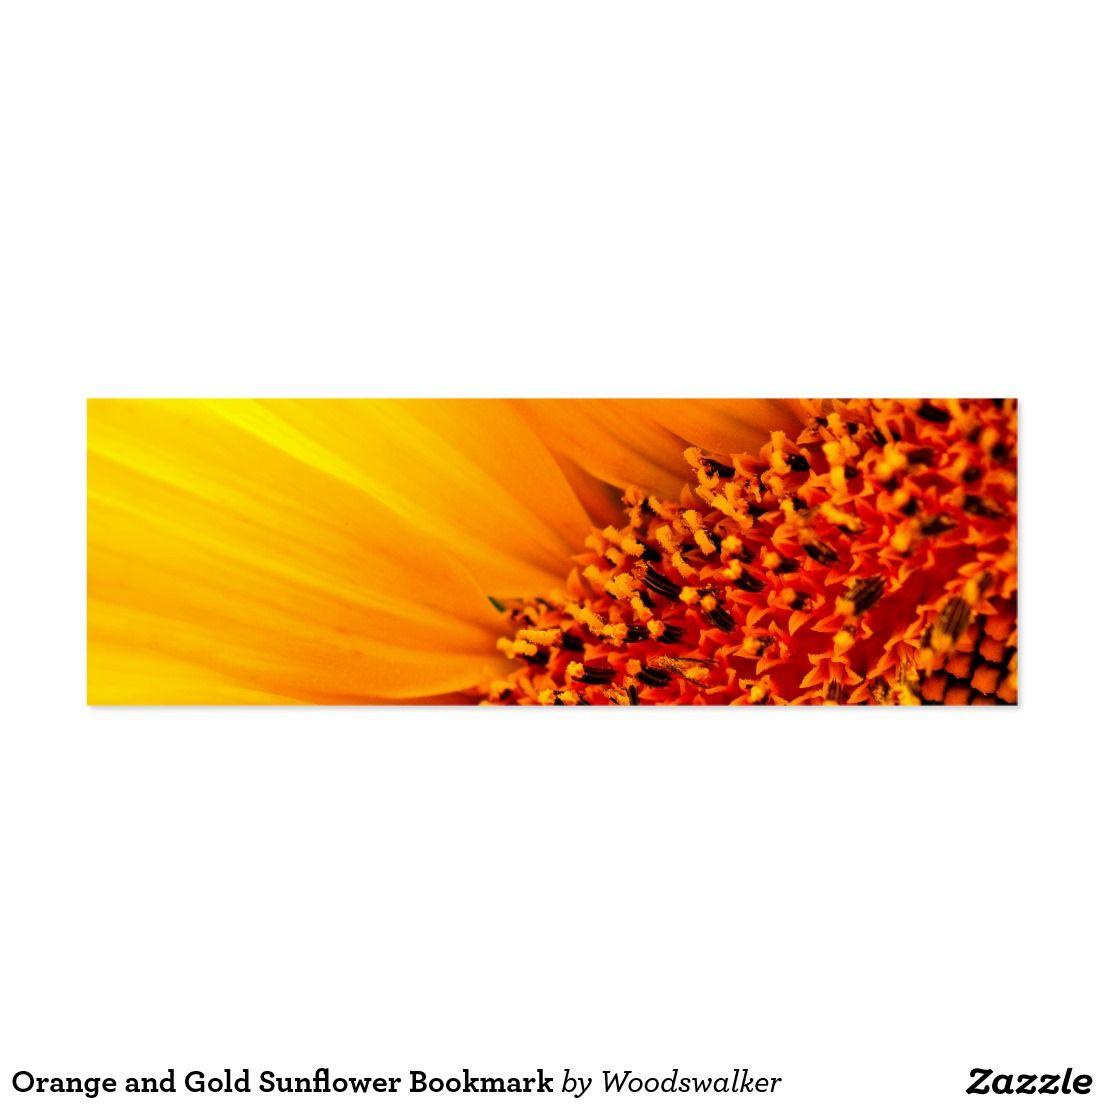 Orange and Gold Sunflower Bookmark Mini Business Card Designed by Woodswalker on www.zazzle.com/woodswalker*/